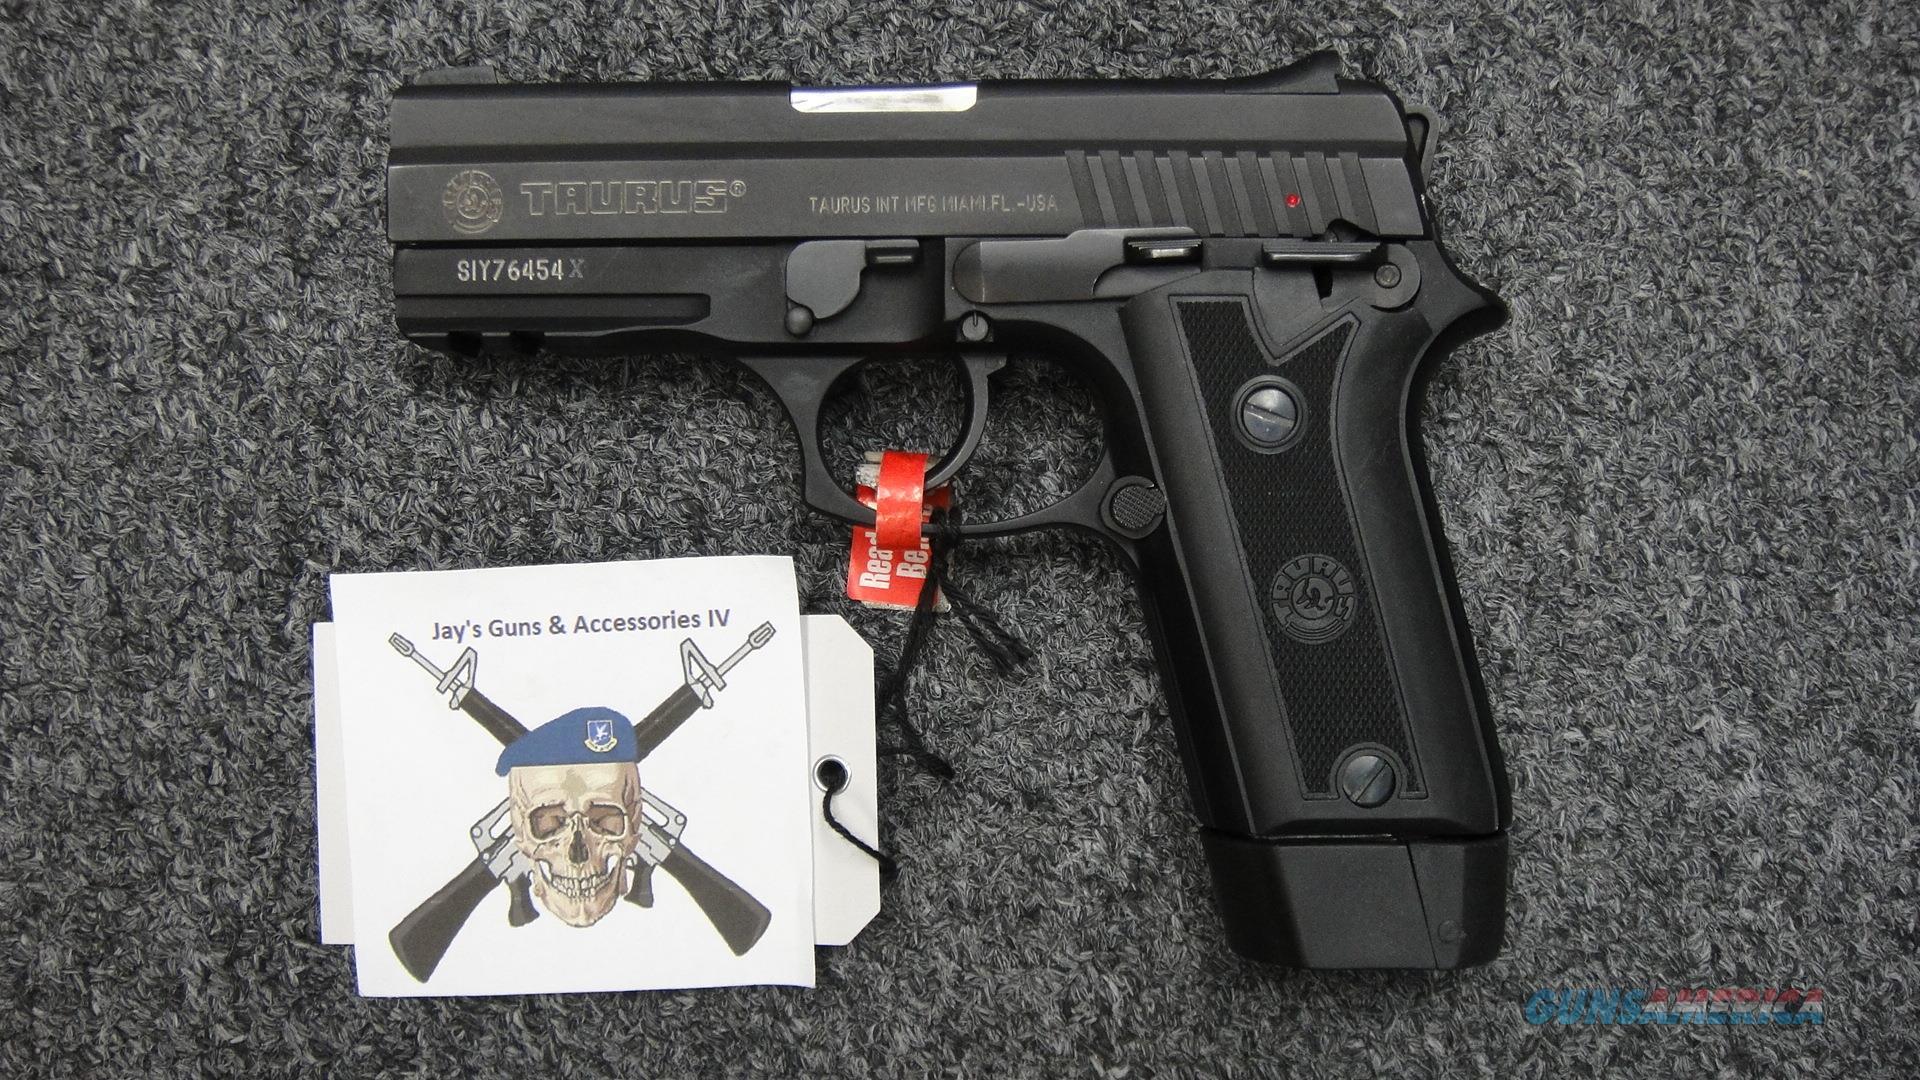 Taurus PT940 .40S&W 12+1  Guns > Pistols > Taurus Pistols > Semi Auto Pistols > Polymer Frame